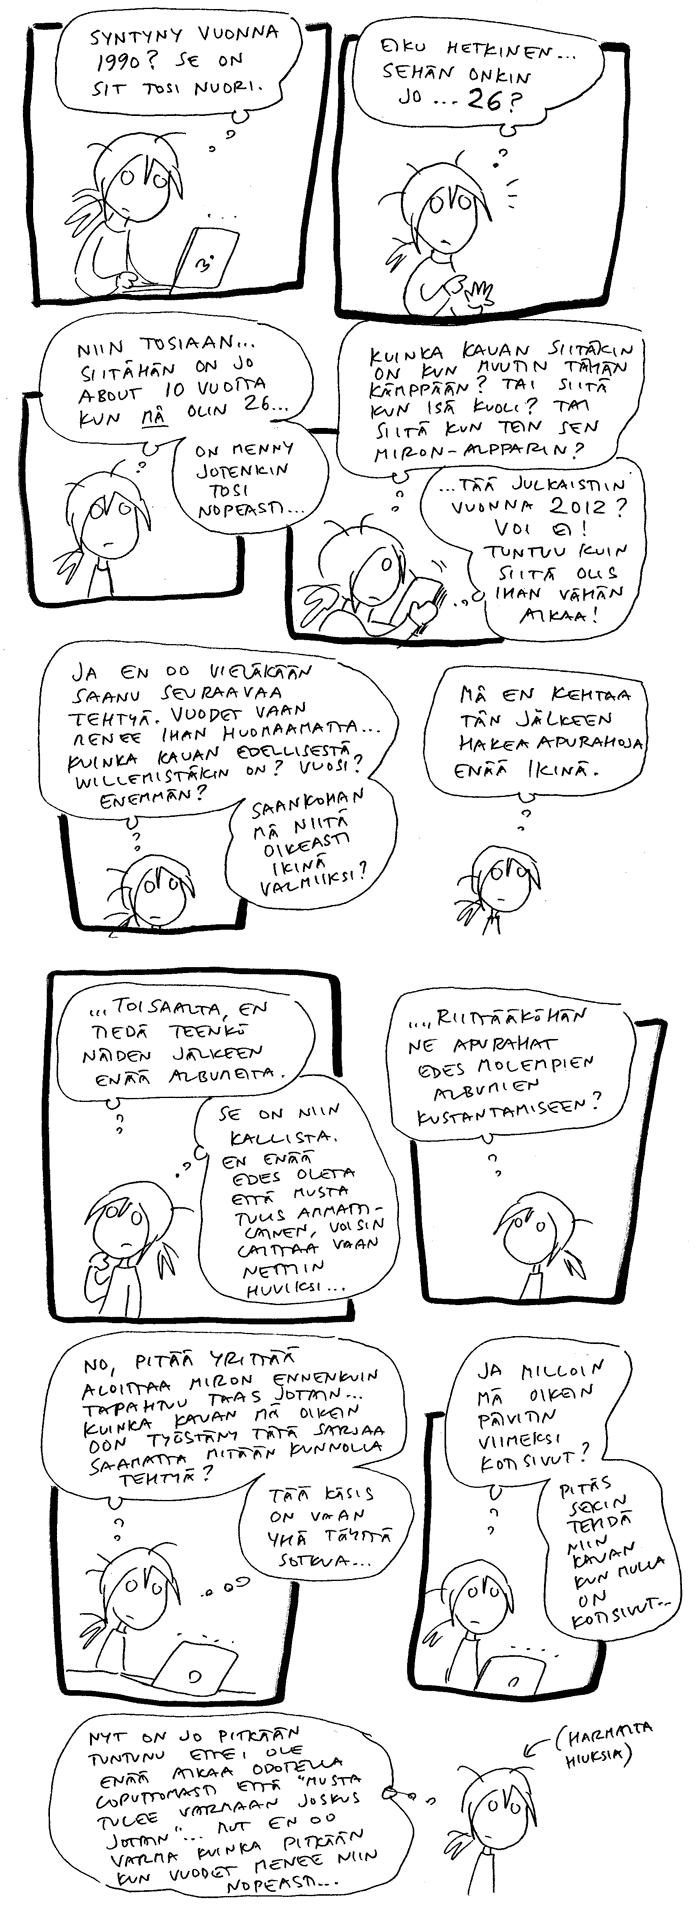 missamennaan